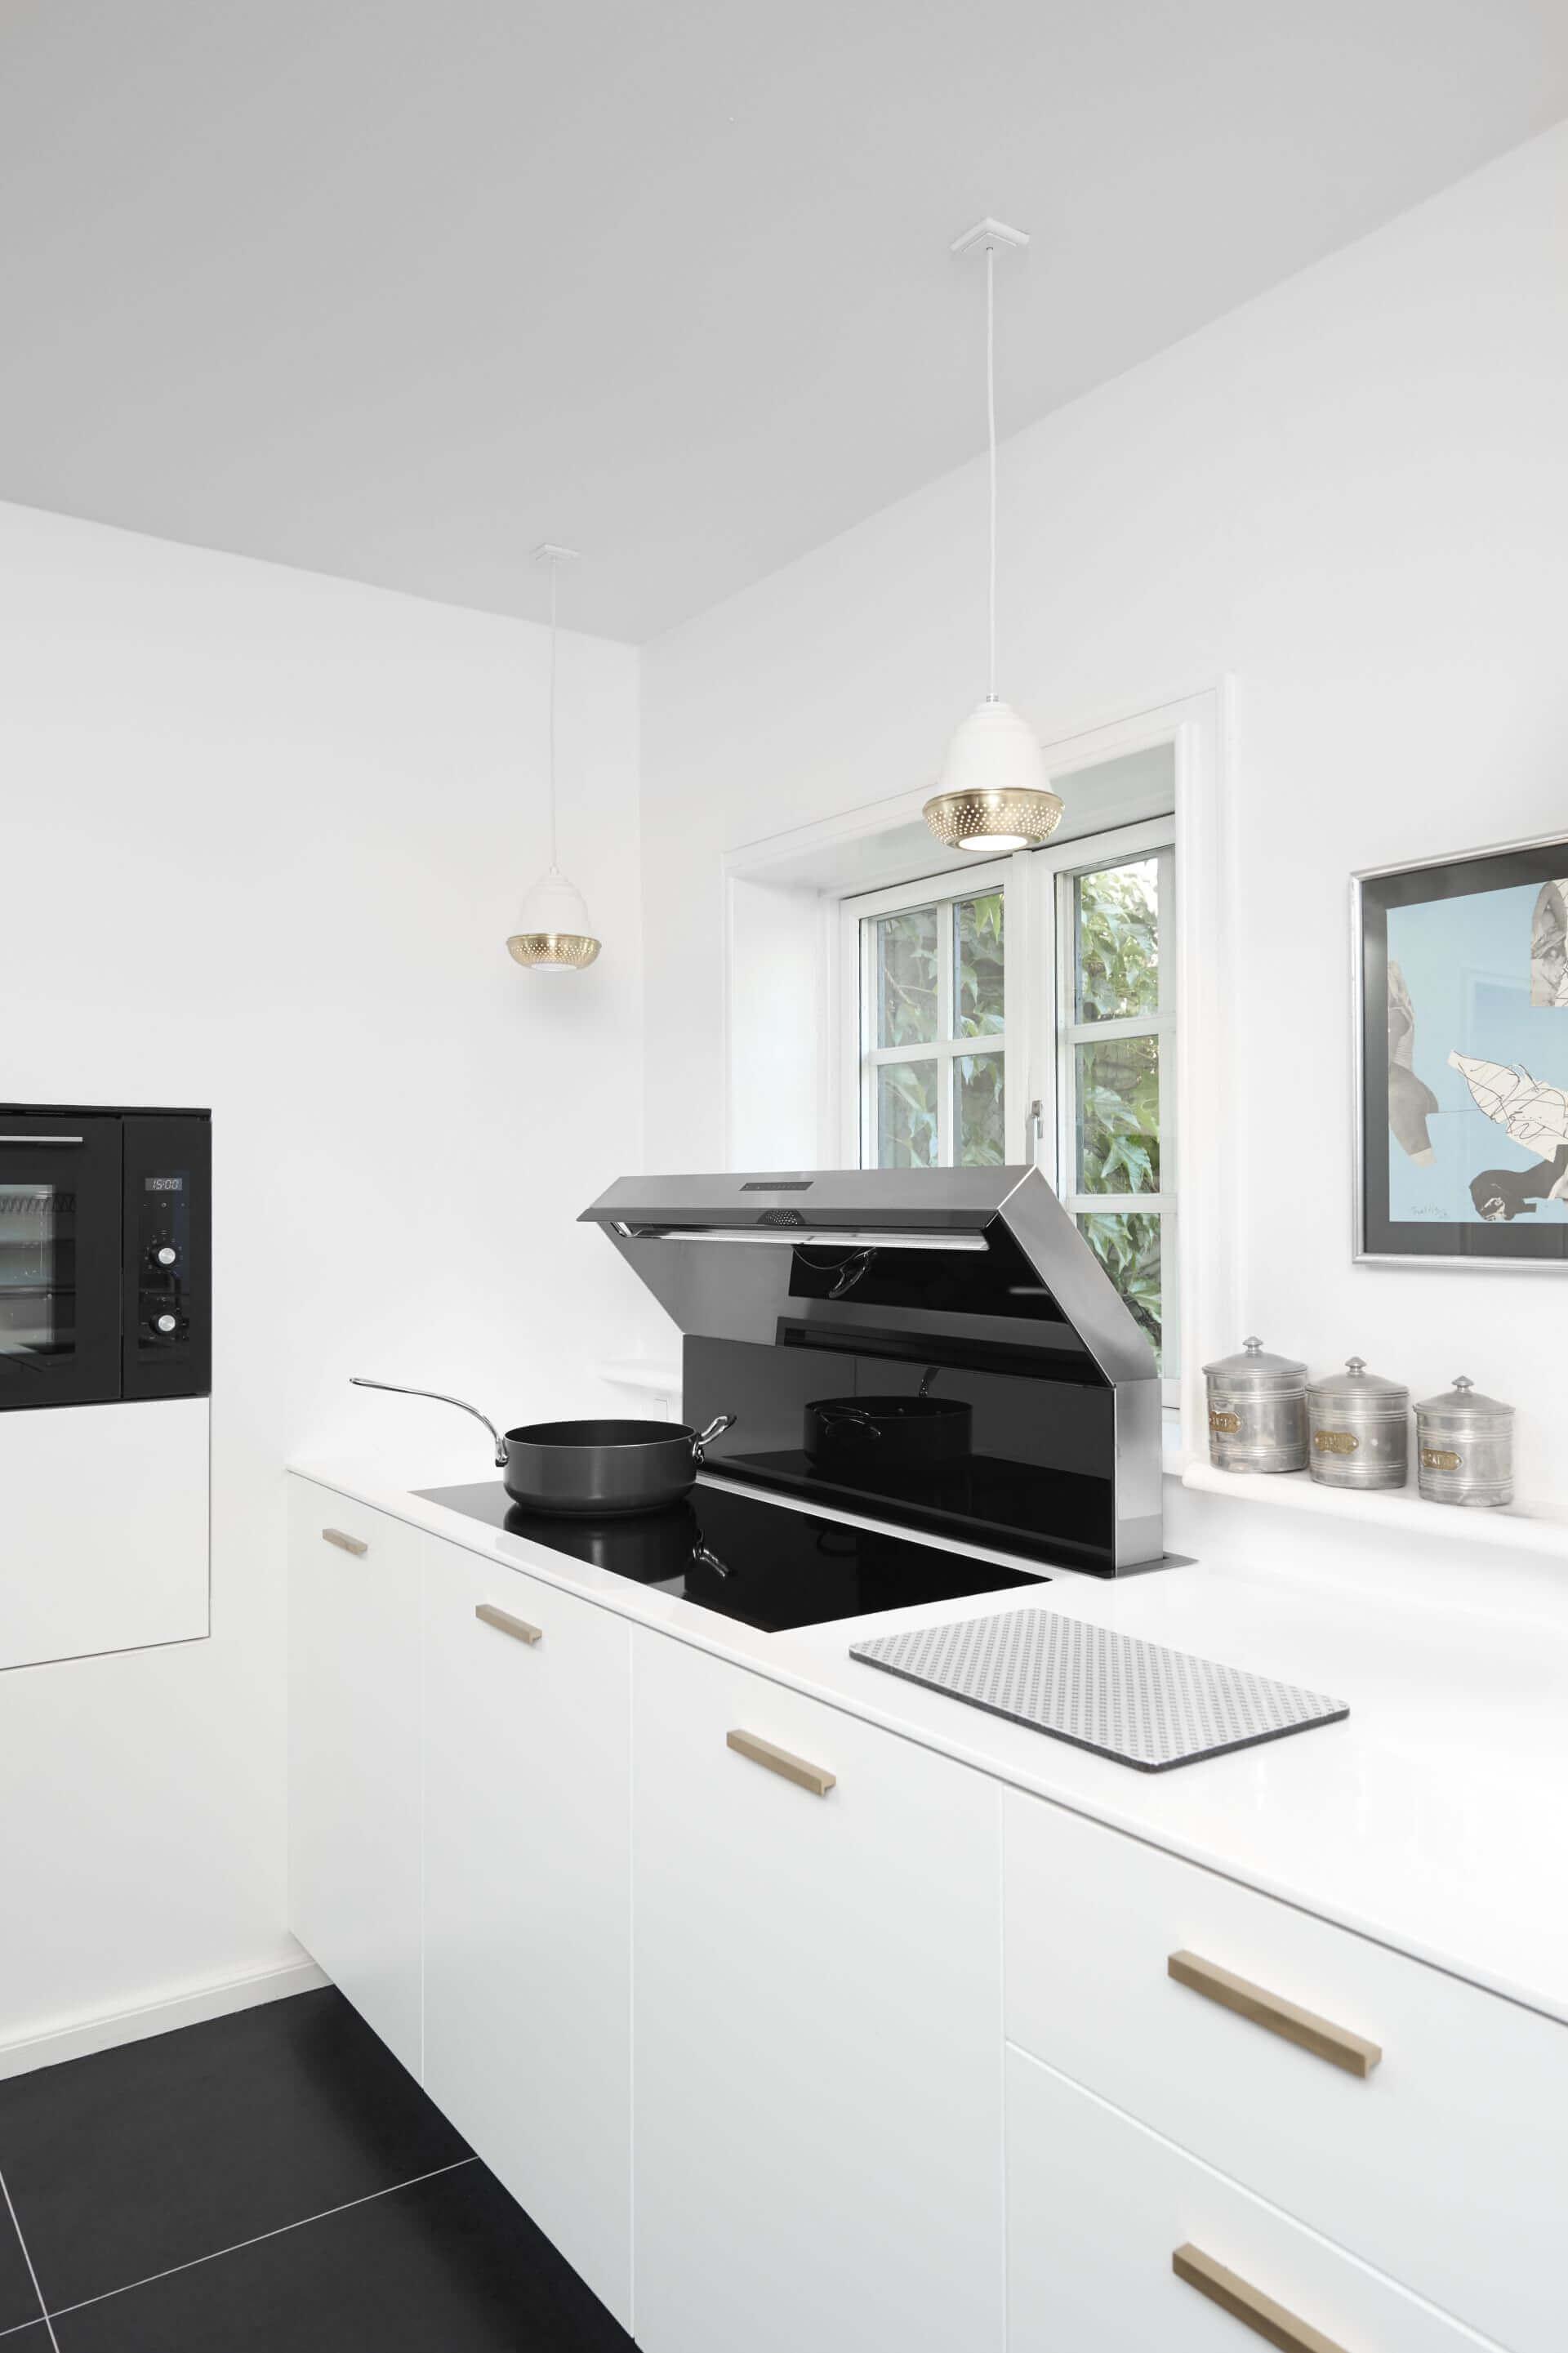 berbel dunstabzugshauben m bel spanrad rosenheim. Black Bedroom Furniture Sets. Home Design Ideas